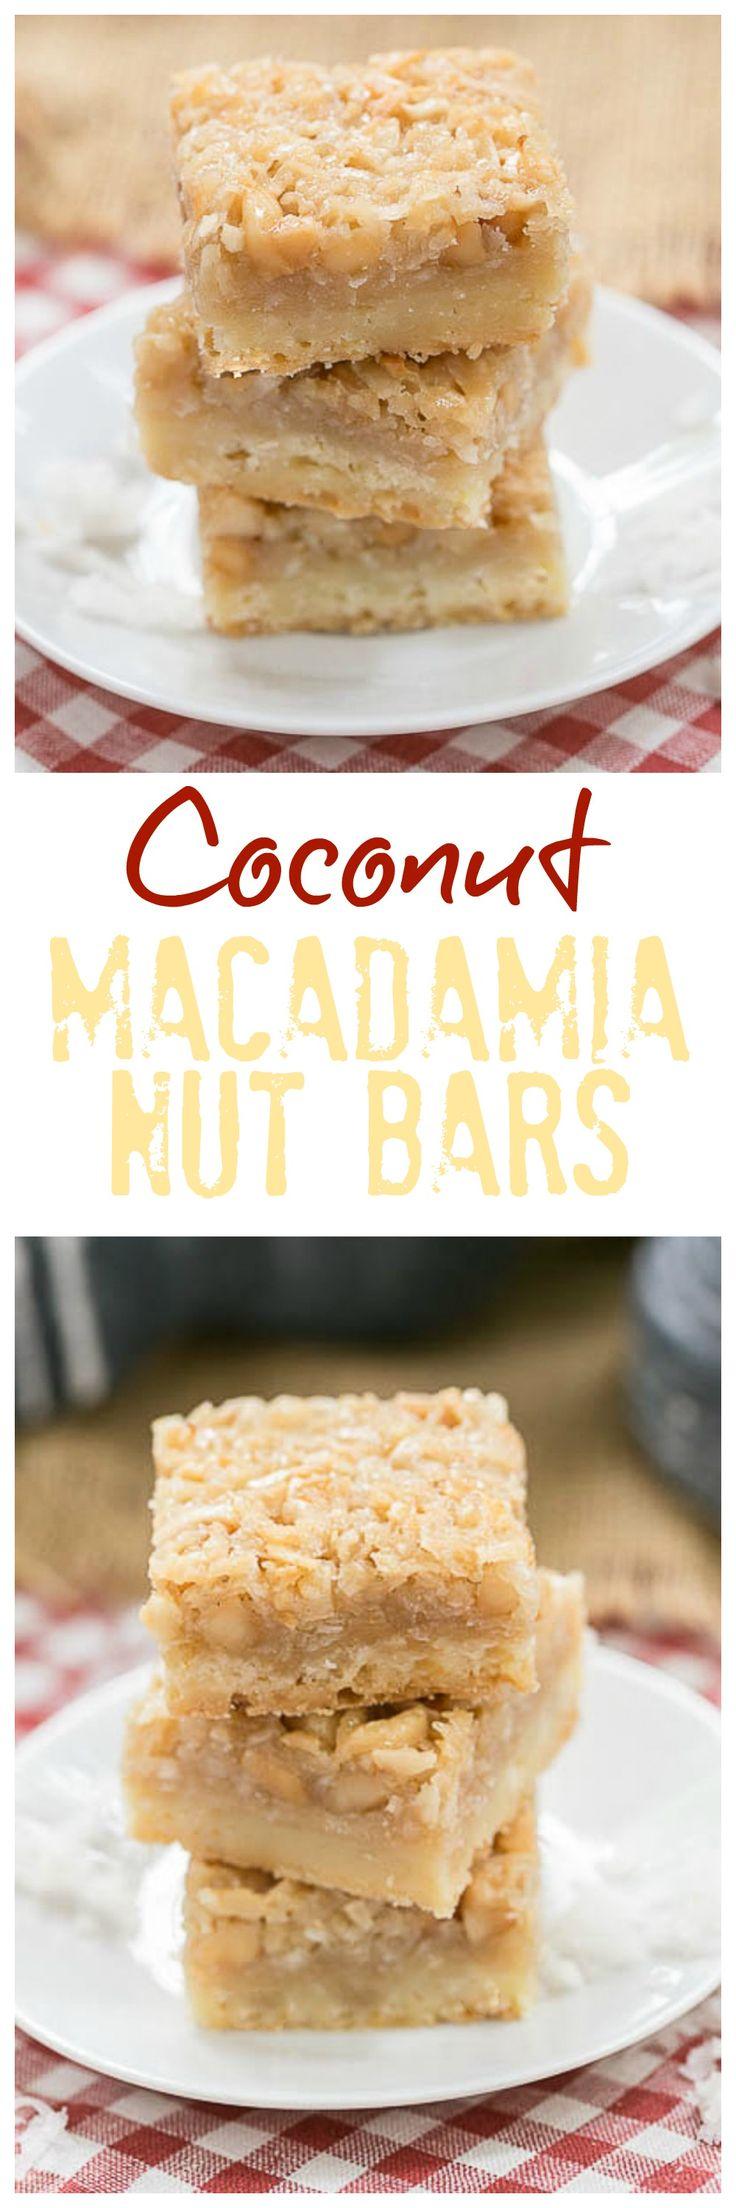 Coconut Macadamia Nut Bars | Coconut lovers' dream bars! @lizzydo